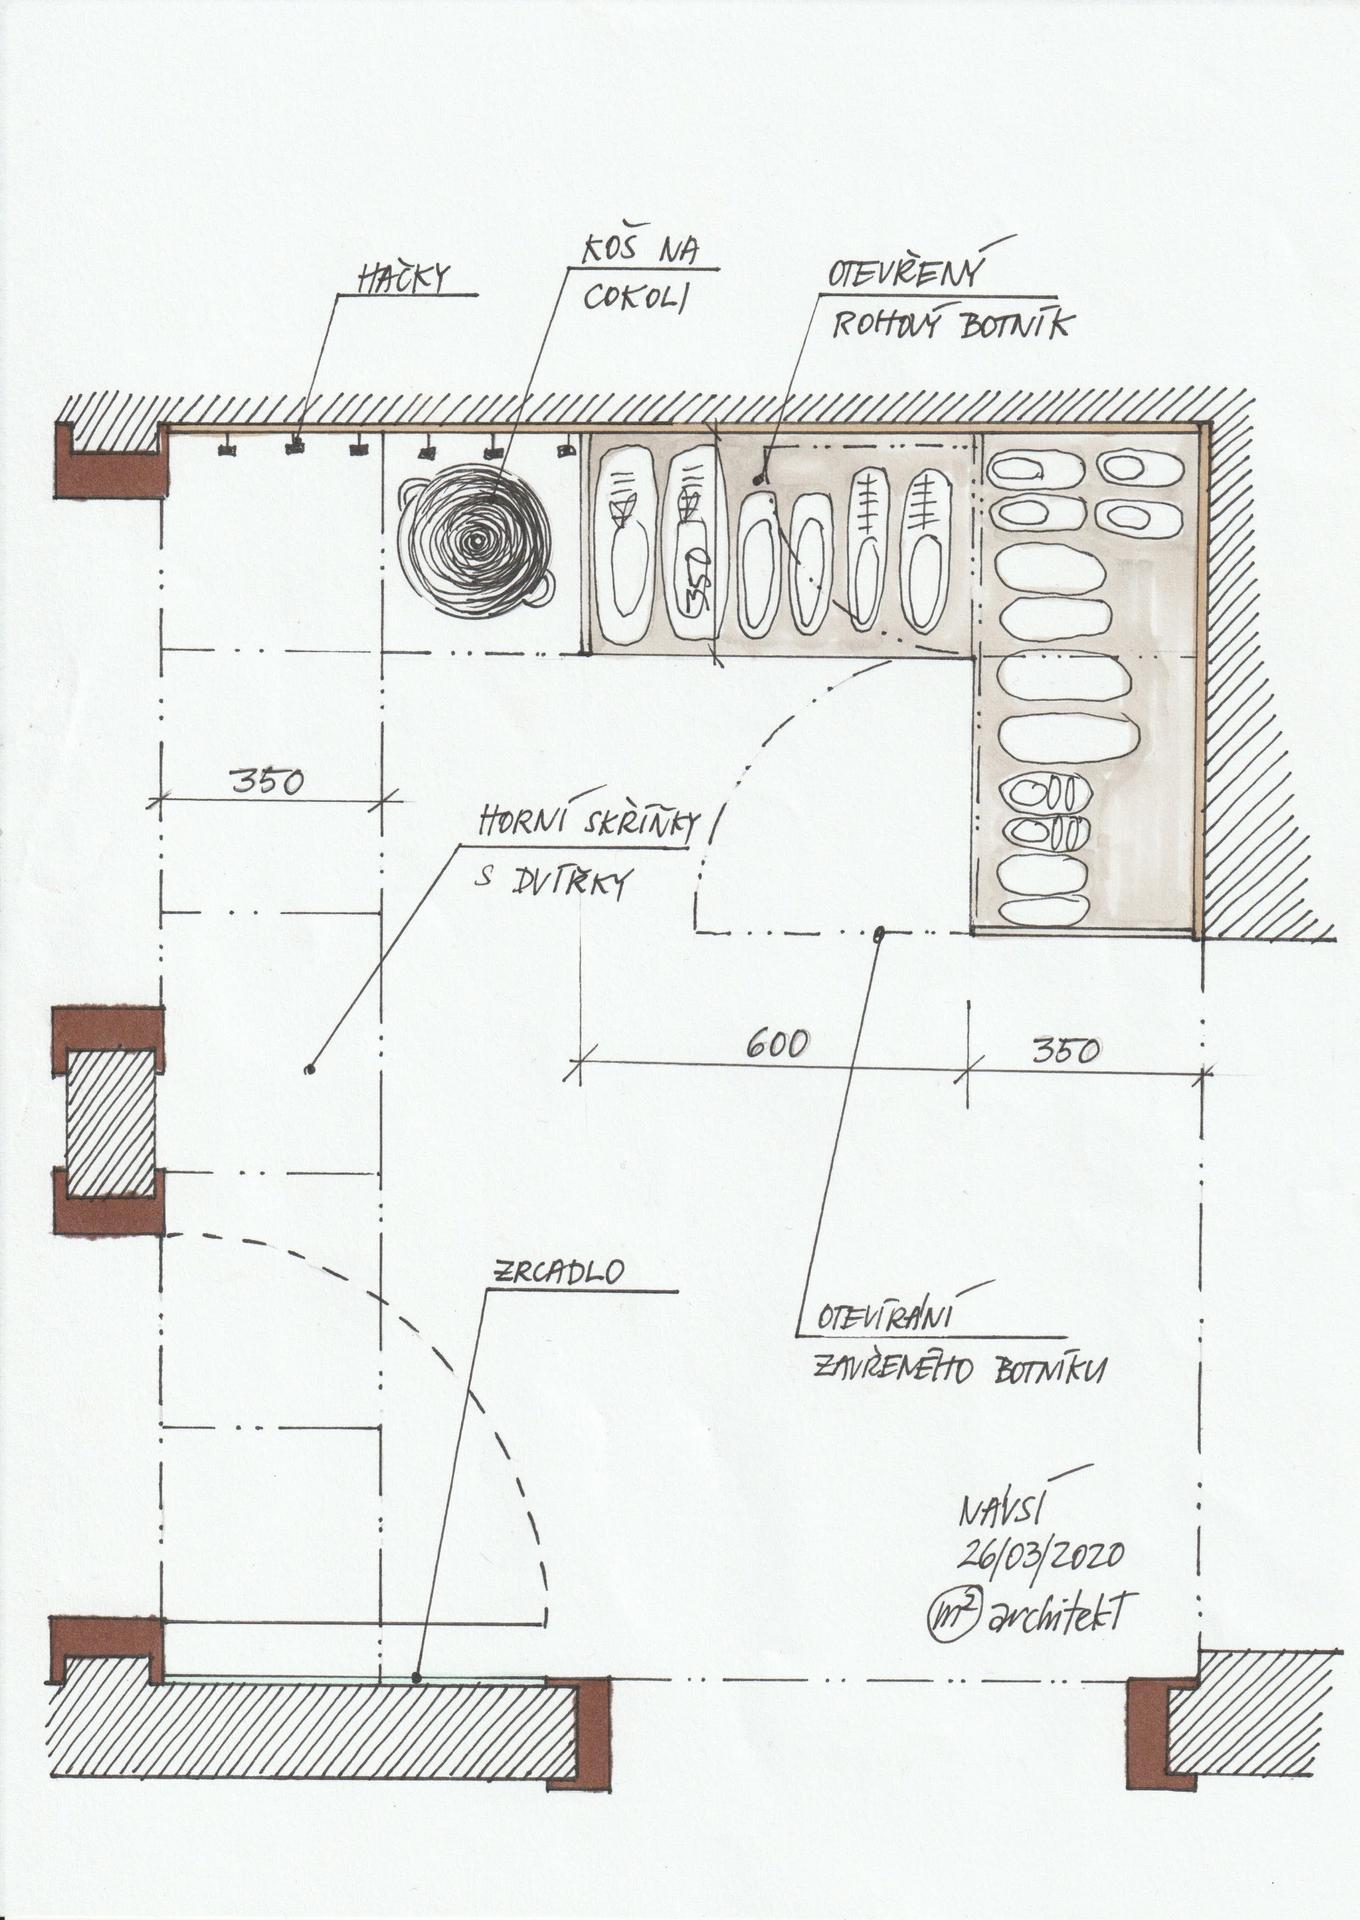 Promena maleho zádveří - Obrázek č. 2